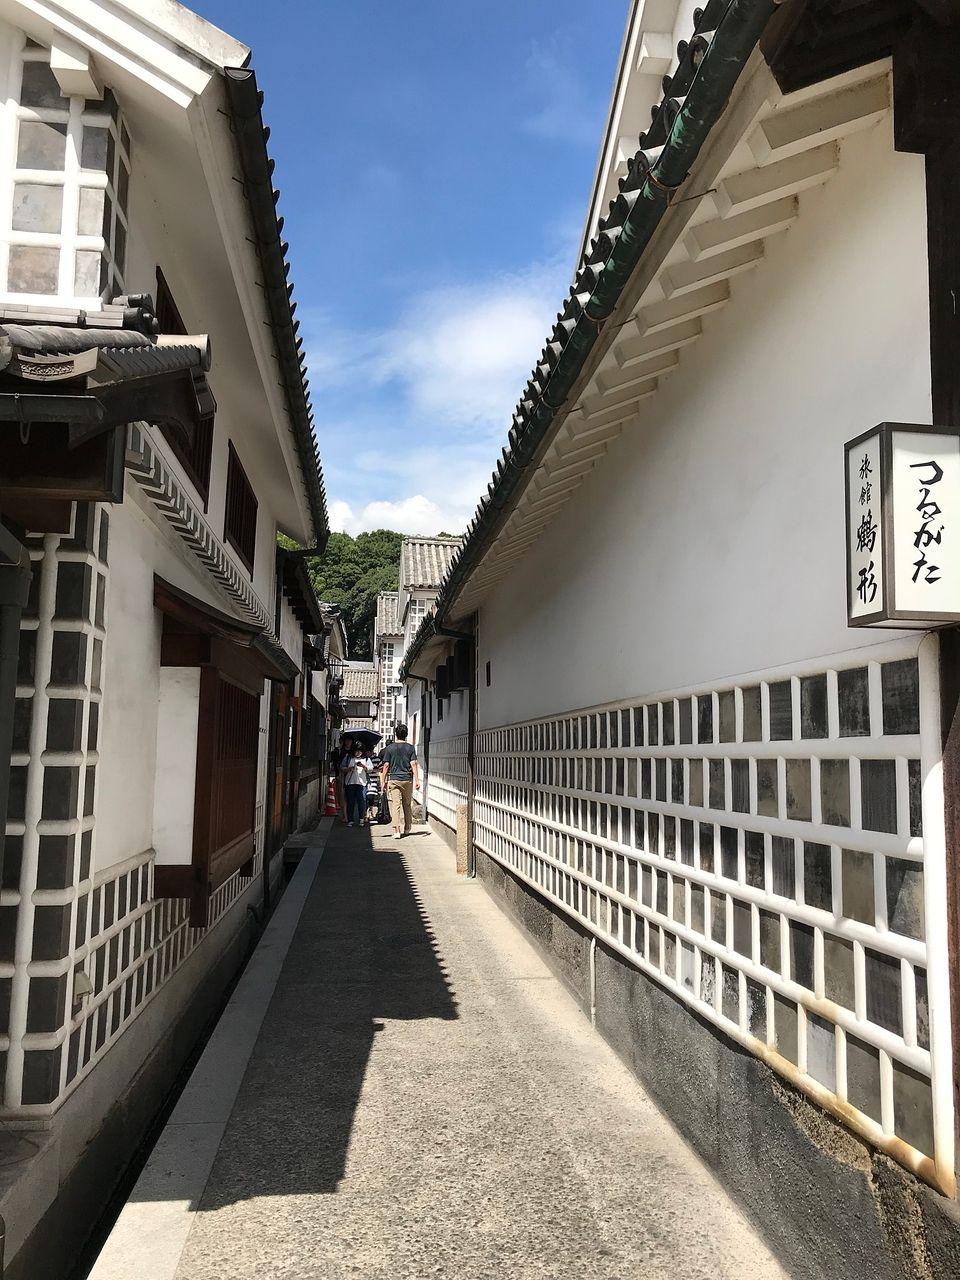 岡山県 倉敷市 蔵の町